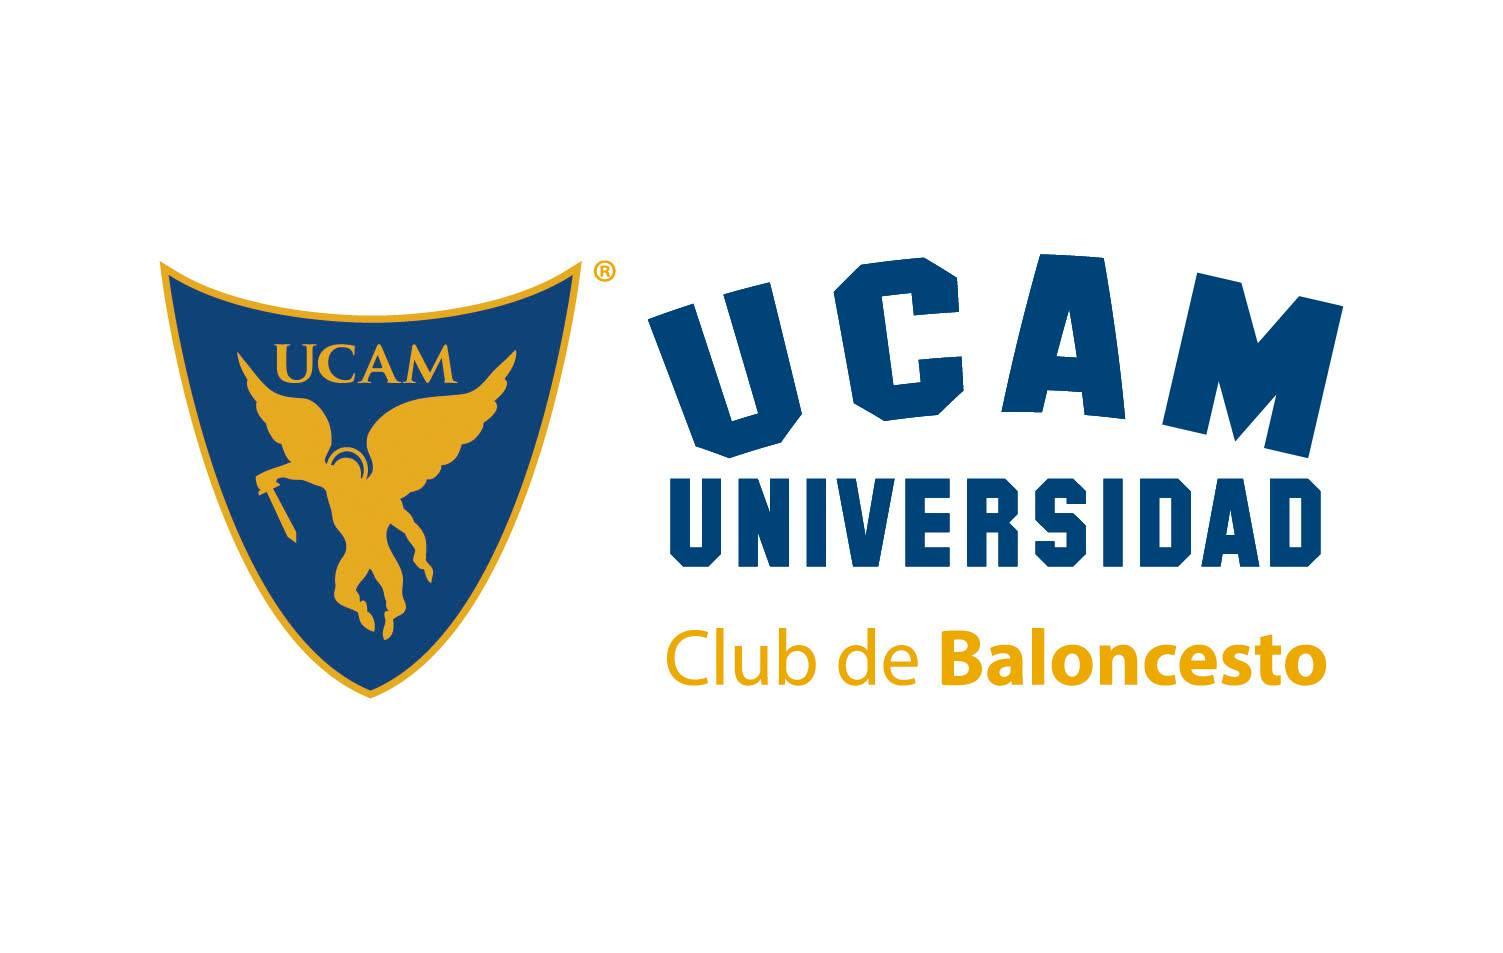 UCAM de Murcia